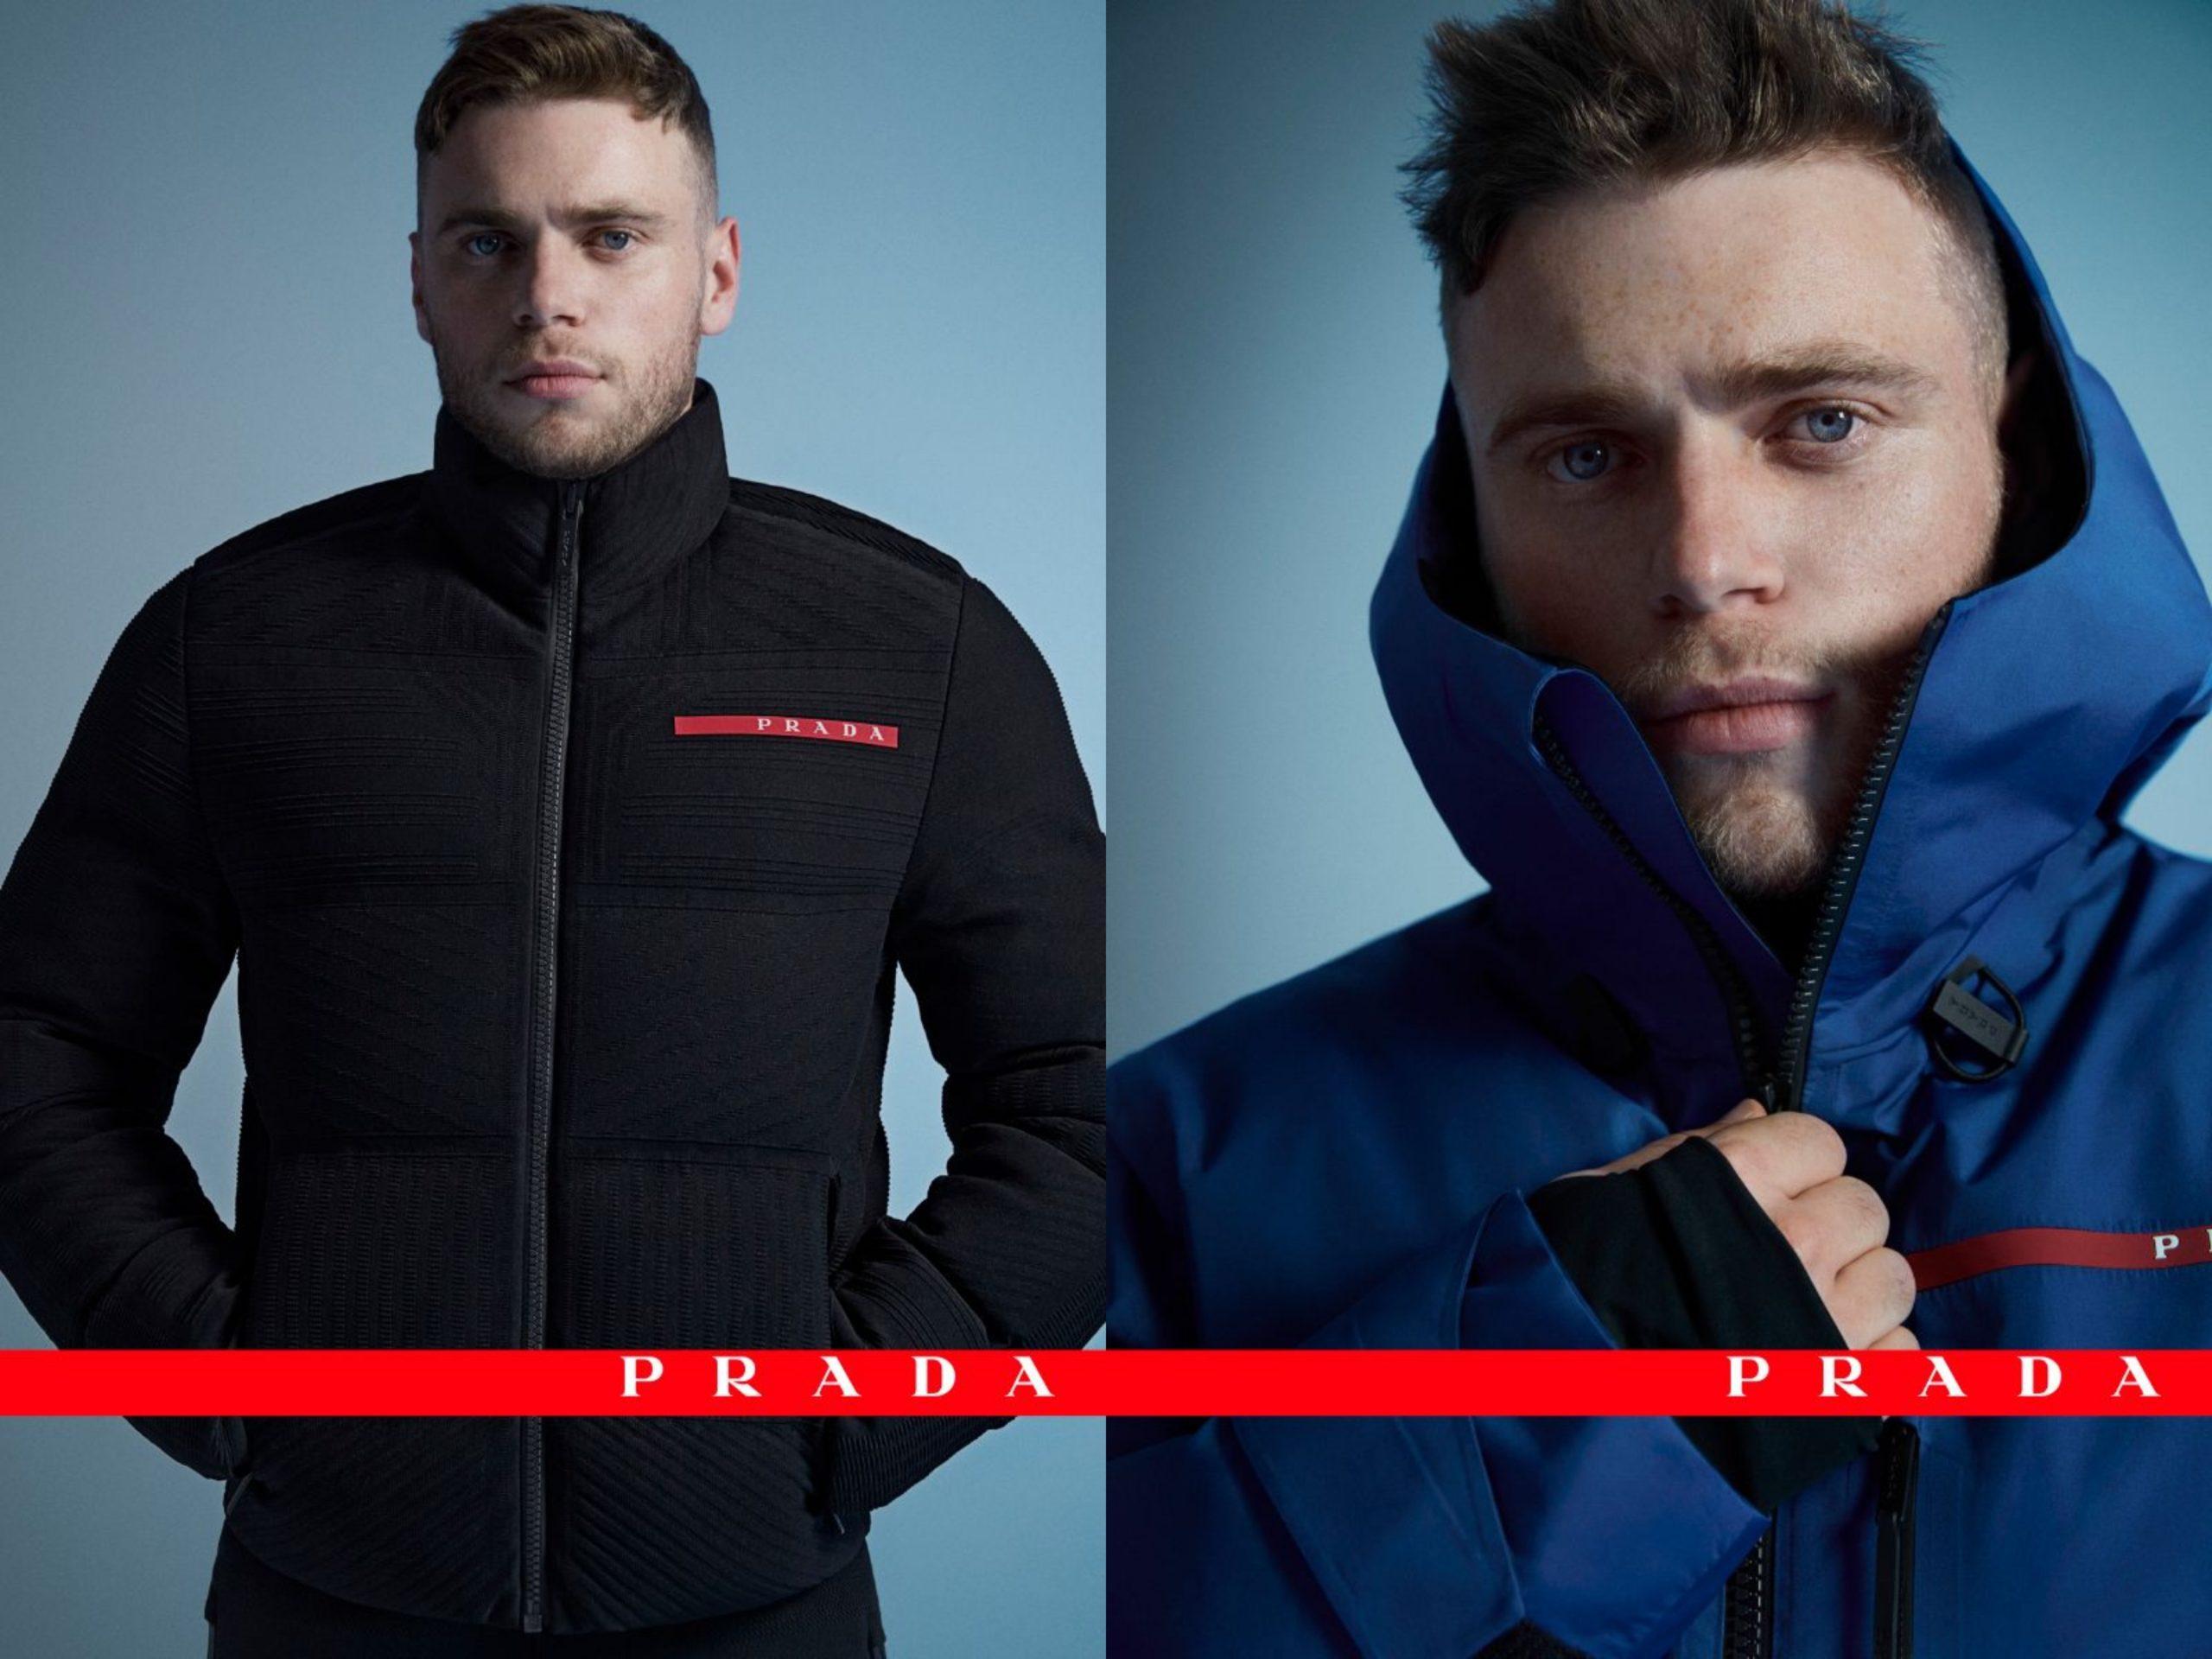 Gus Kenworthy Joins Prada's Linea Rossa Campaign